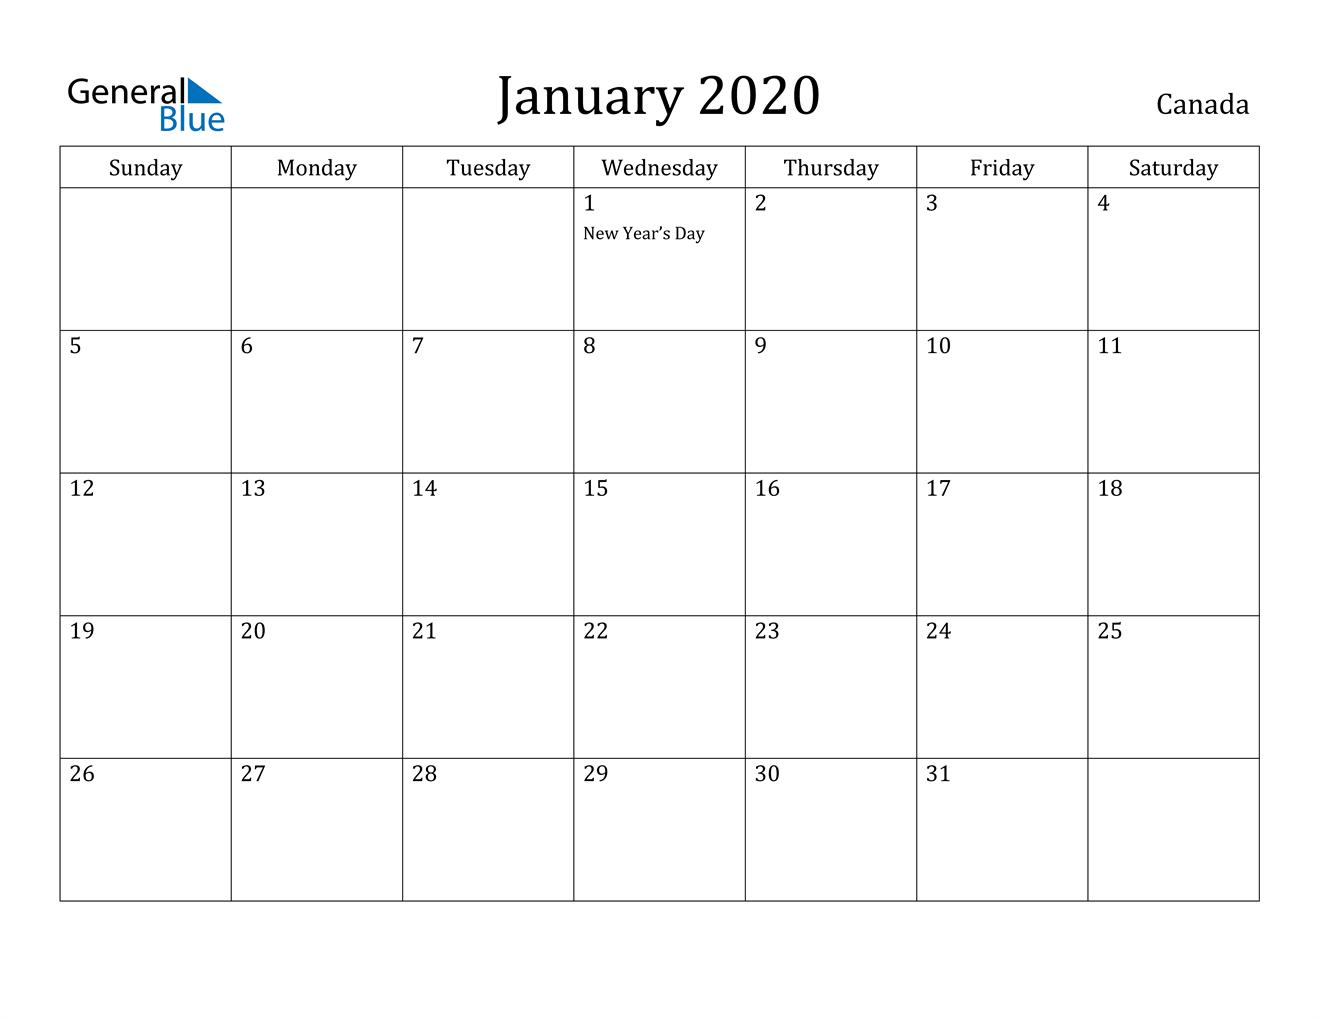 Image of January 2020 Canada Calendar with Holidays Calendar